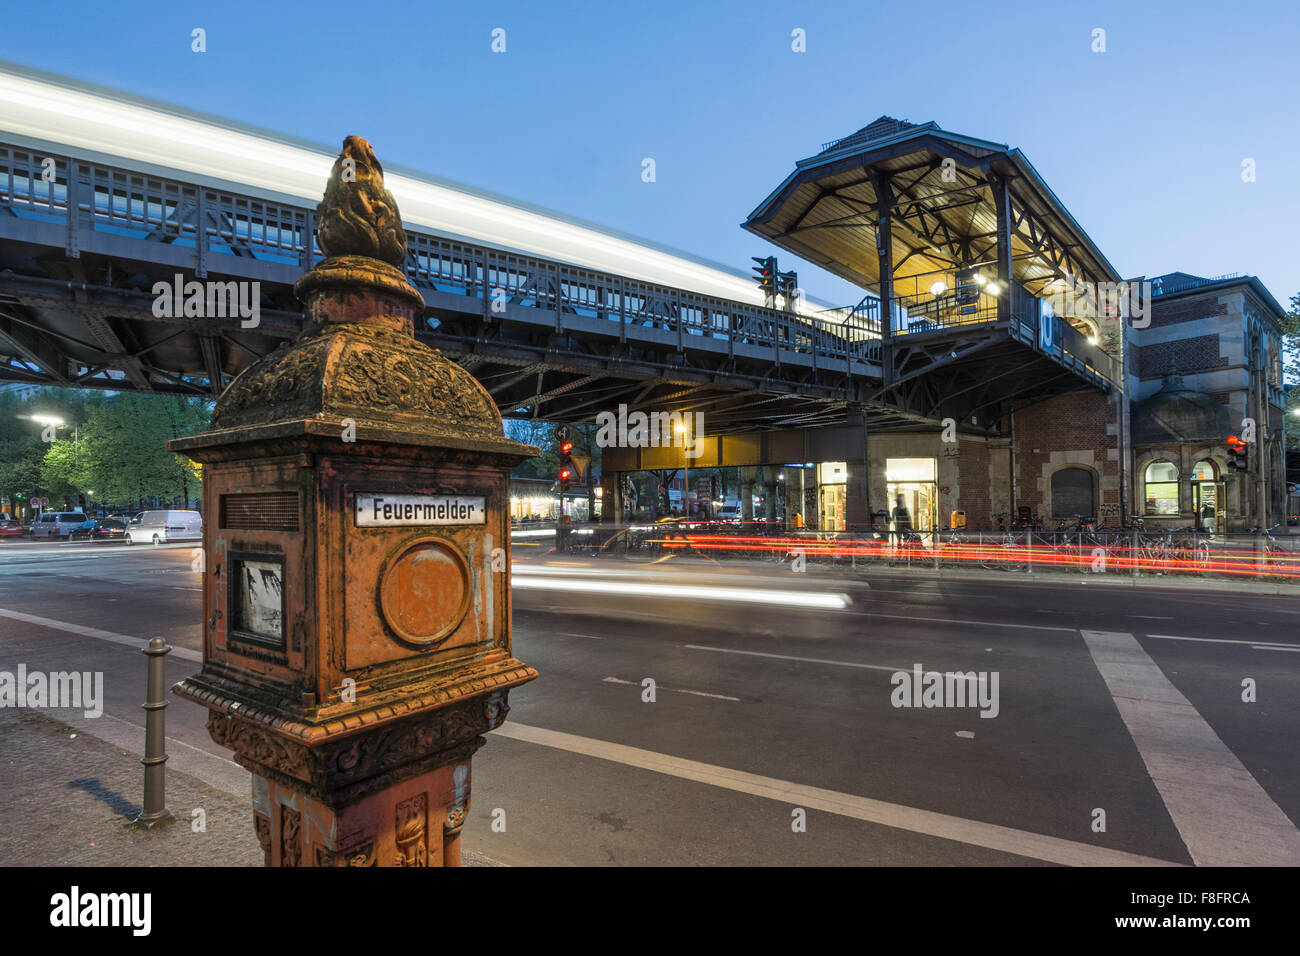 Fire alarm Box  at Metro Station Schlesisches Tor, Kreuzberg, Berlin - Stock Image